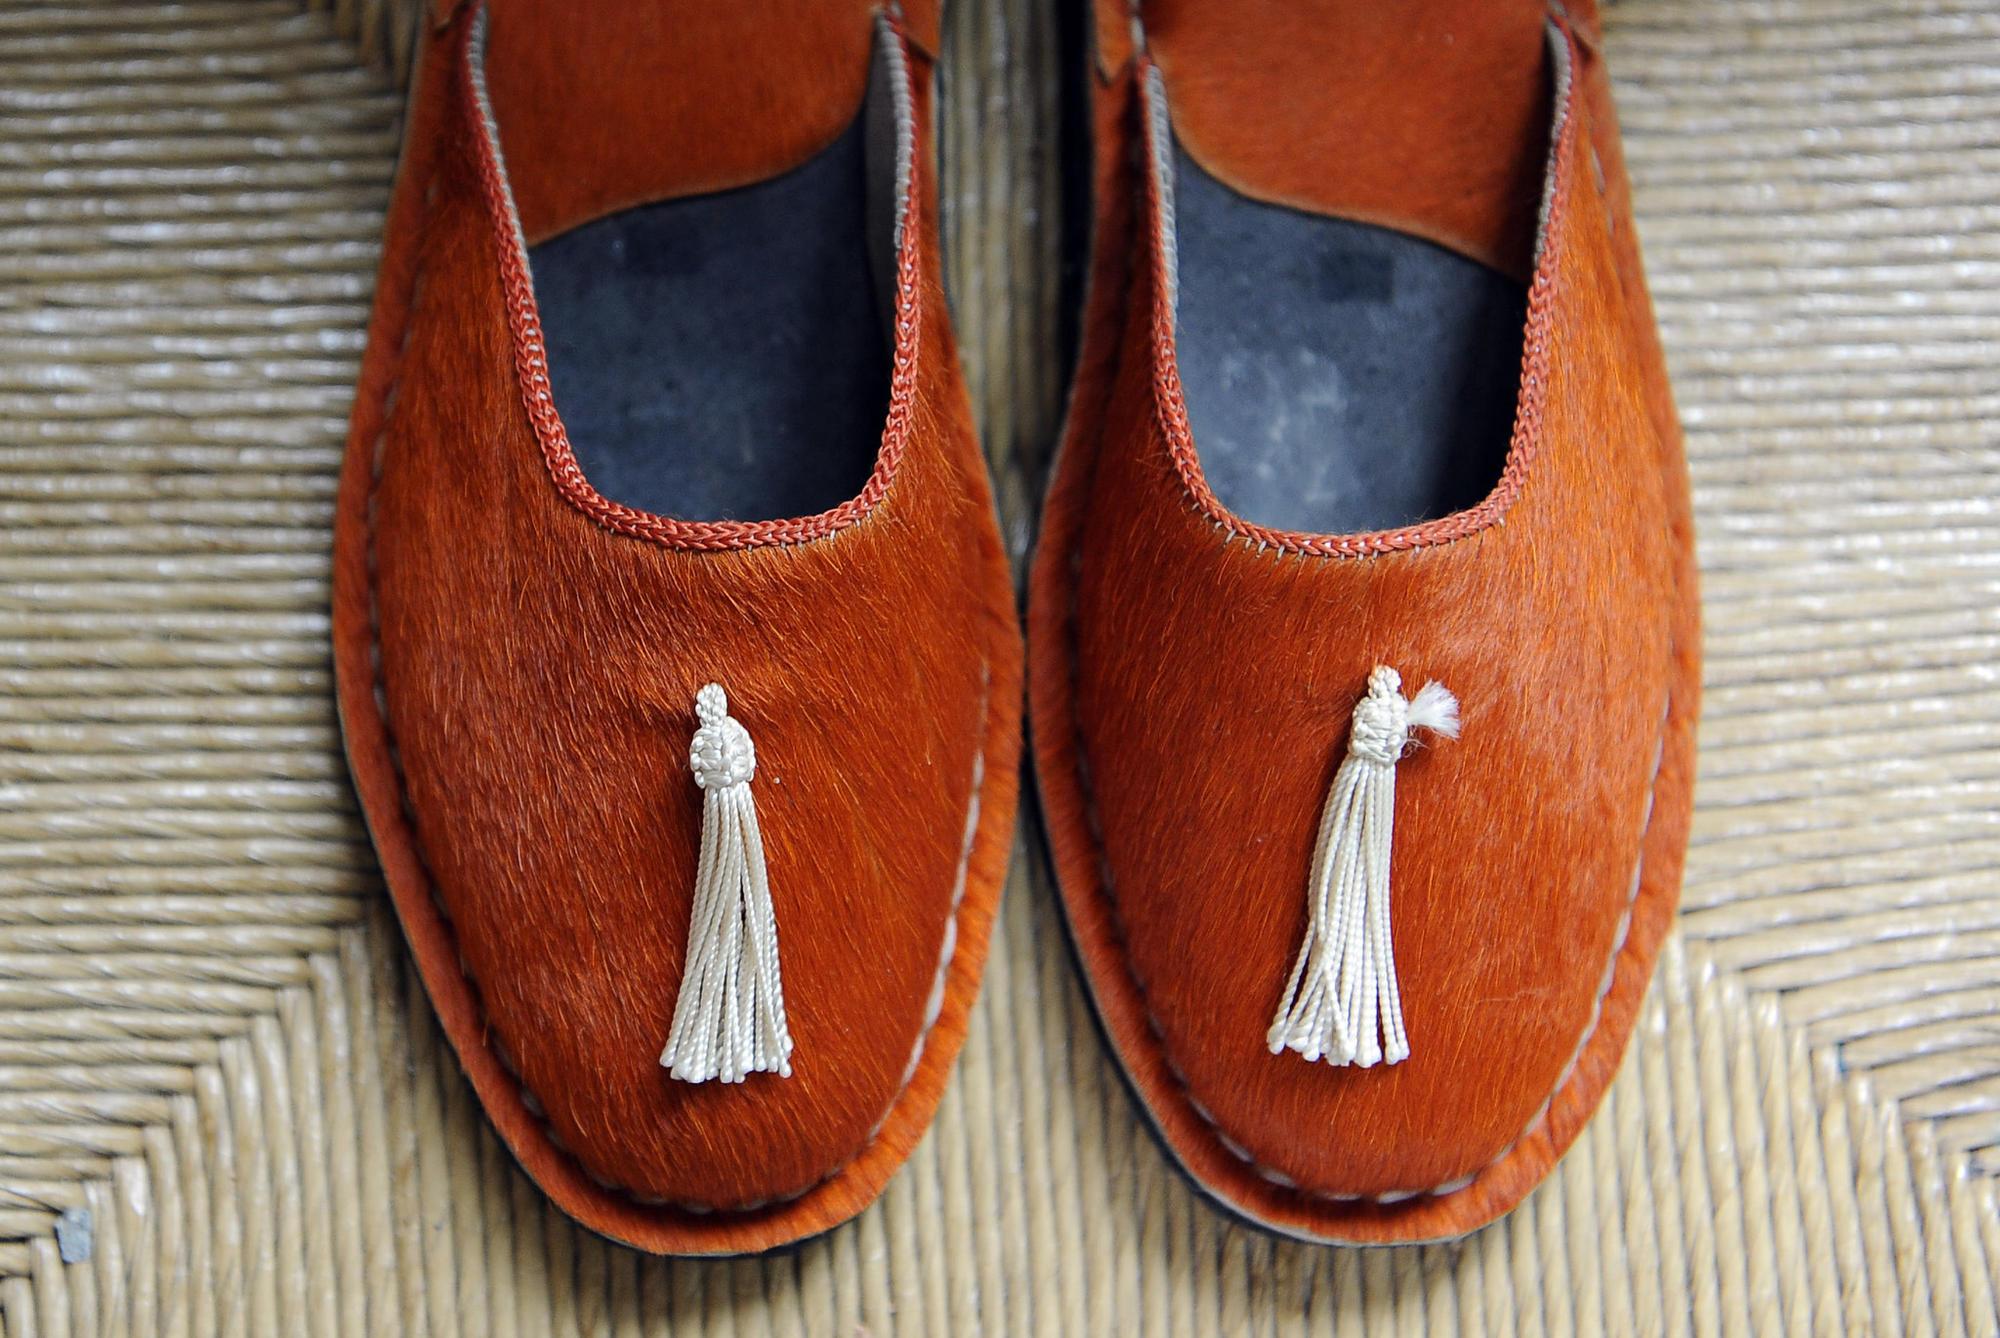 A shoe style by designer Beatrice Valenzuela.